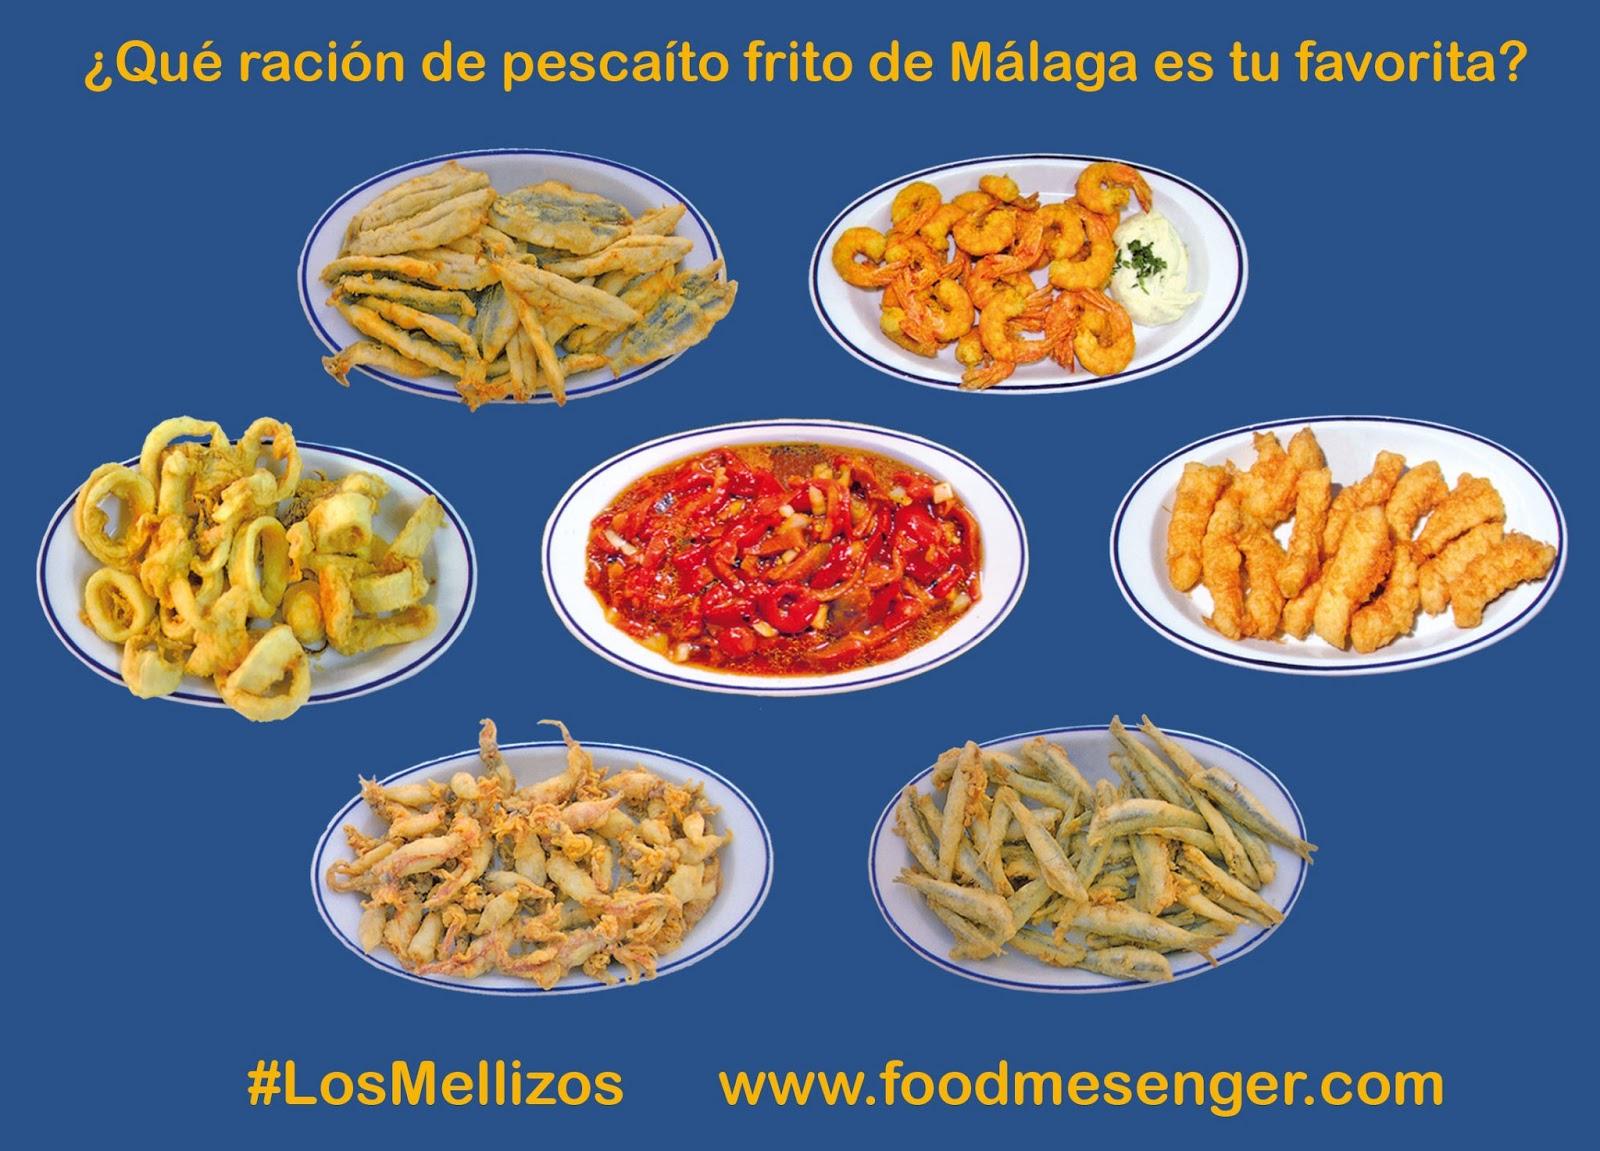 Comida a domicilio de restaurantes de m laga pescaito - Los mellizos malaga ...